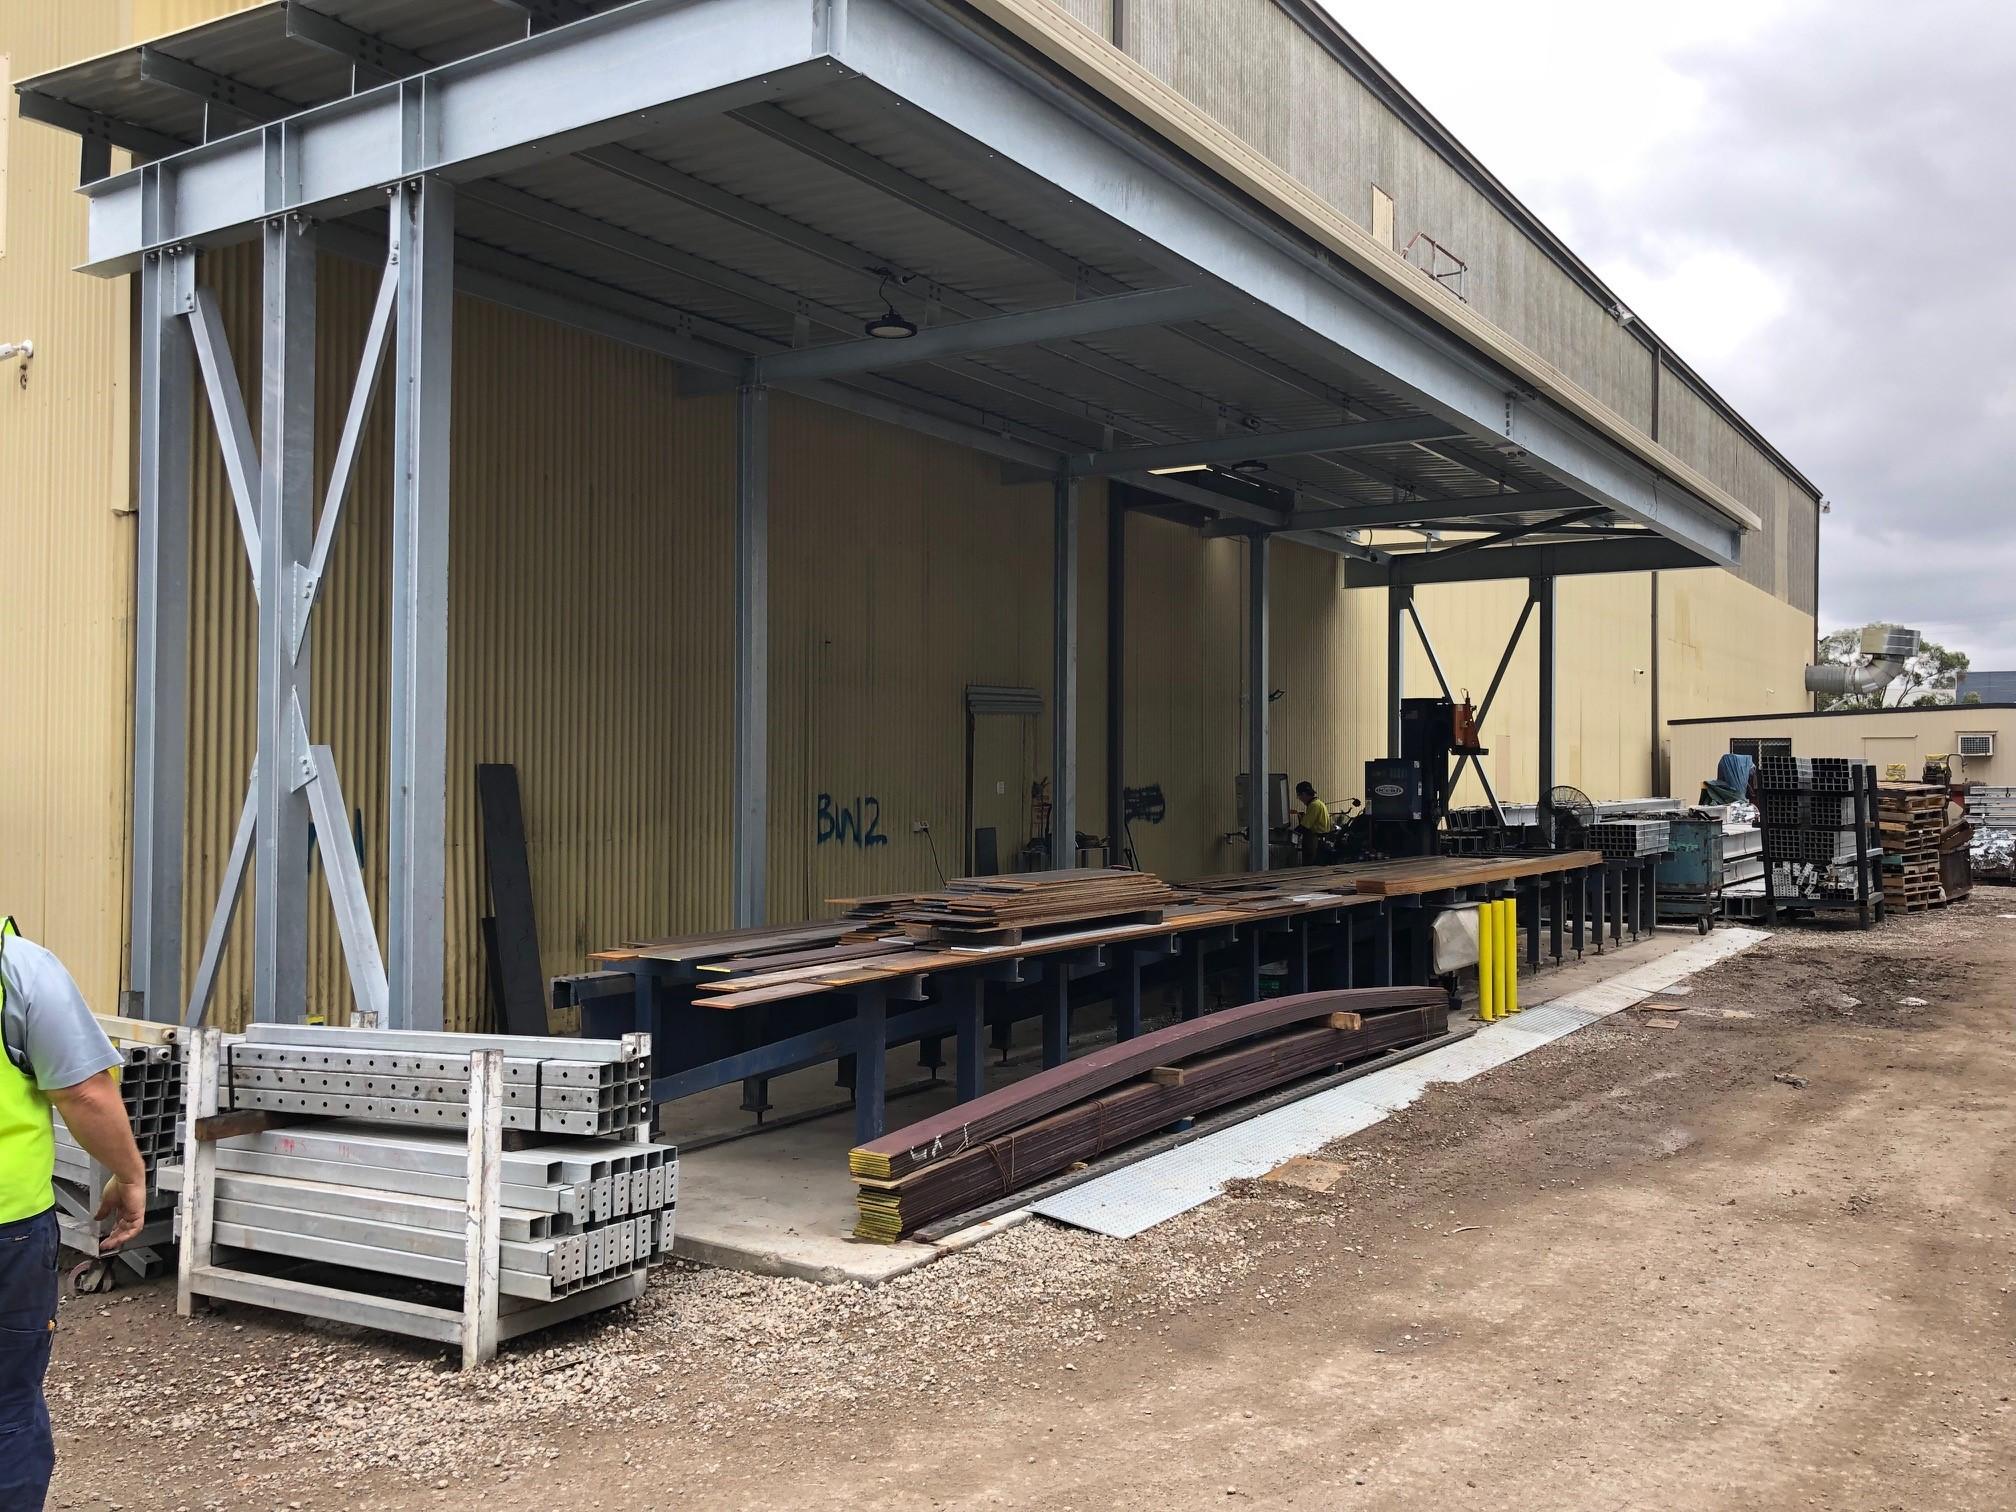 Avenger CNC Beam Line at Steel Builders - Sydney, Austalia